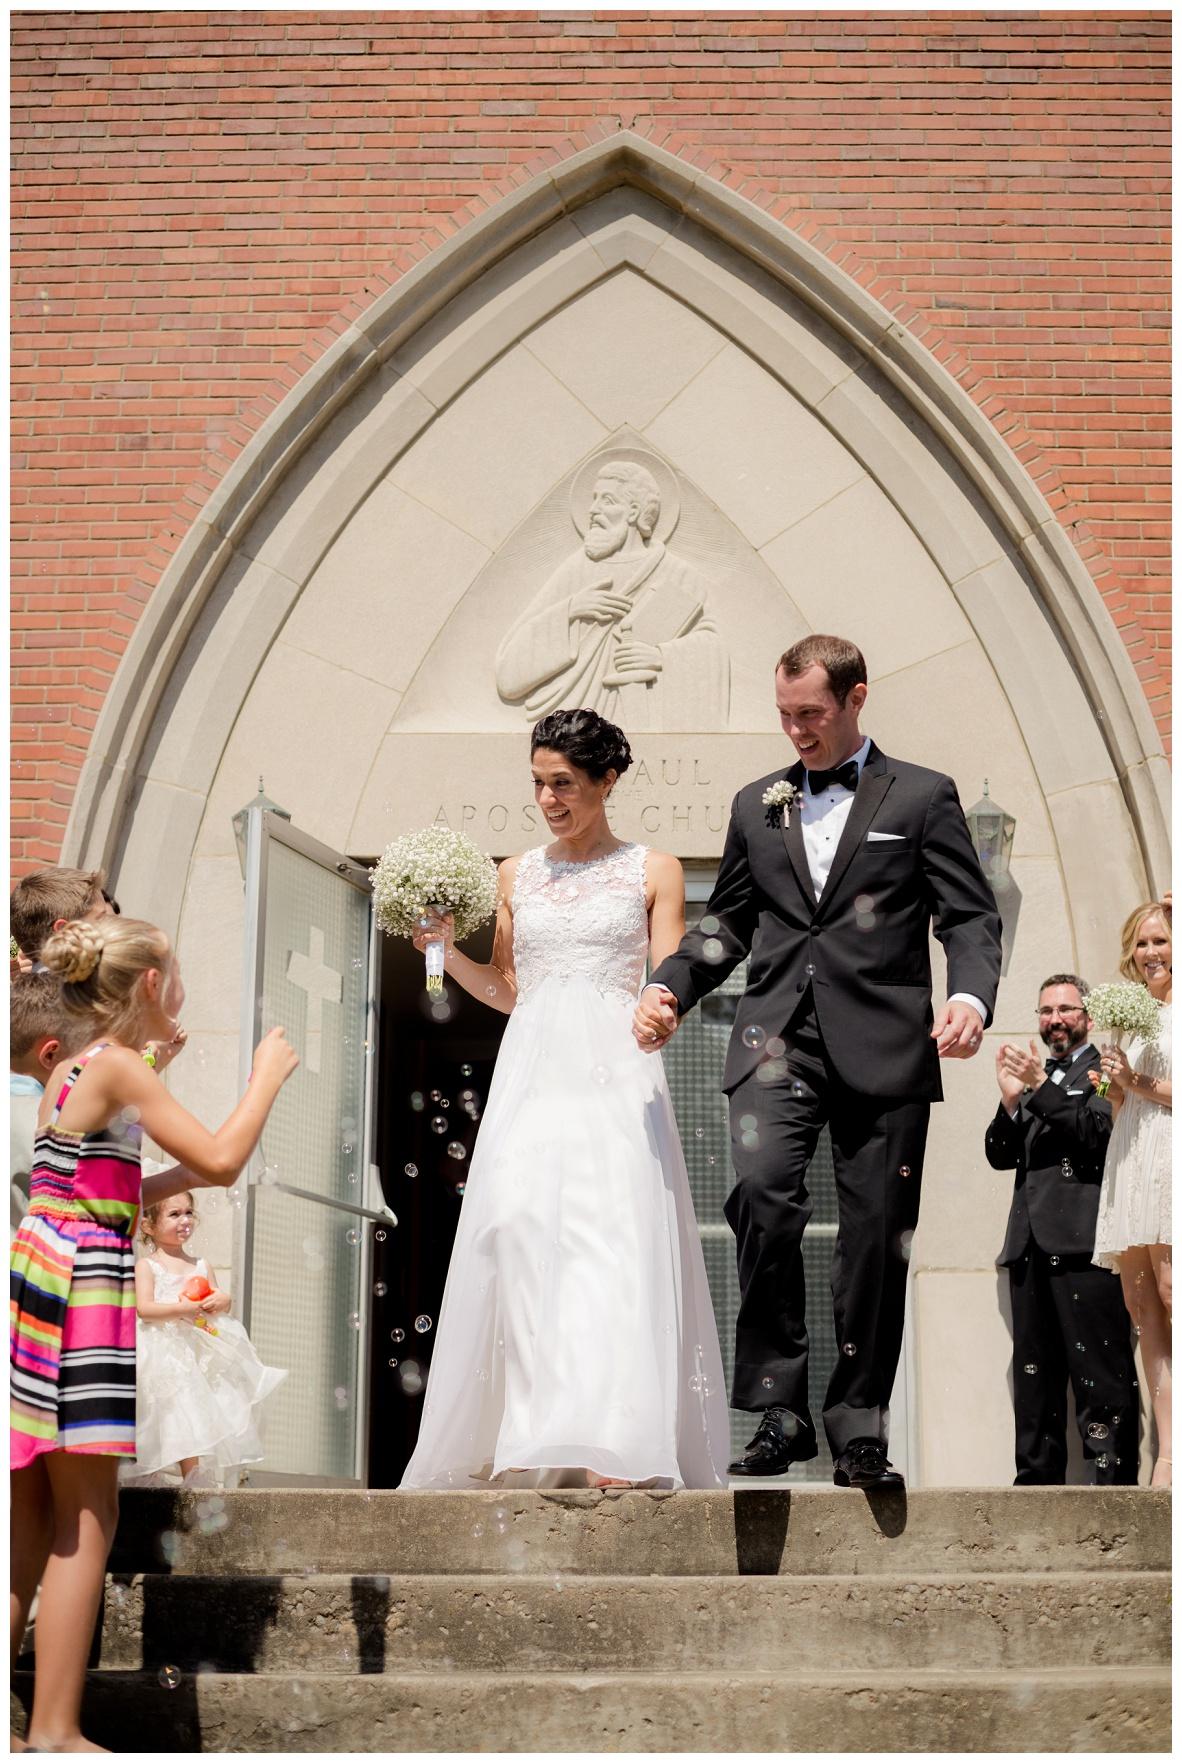 The Wedding of Danielle and Matt_0041.jpg